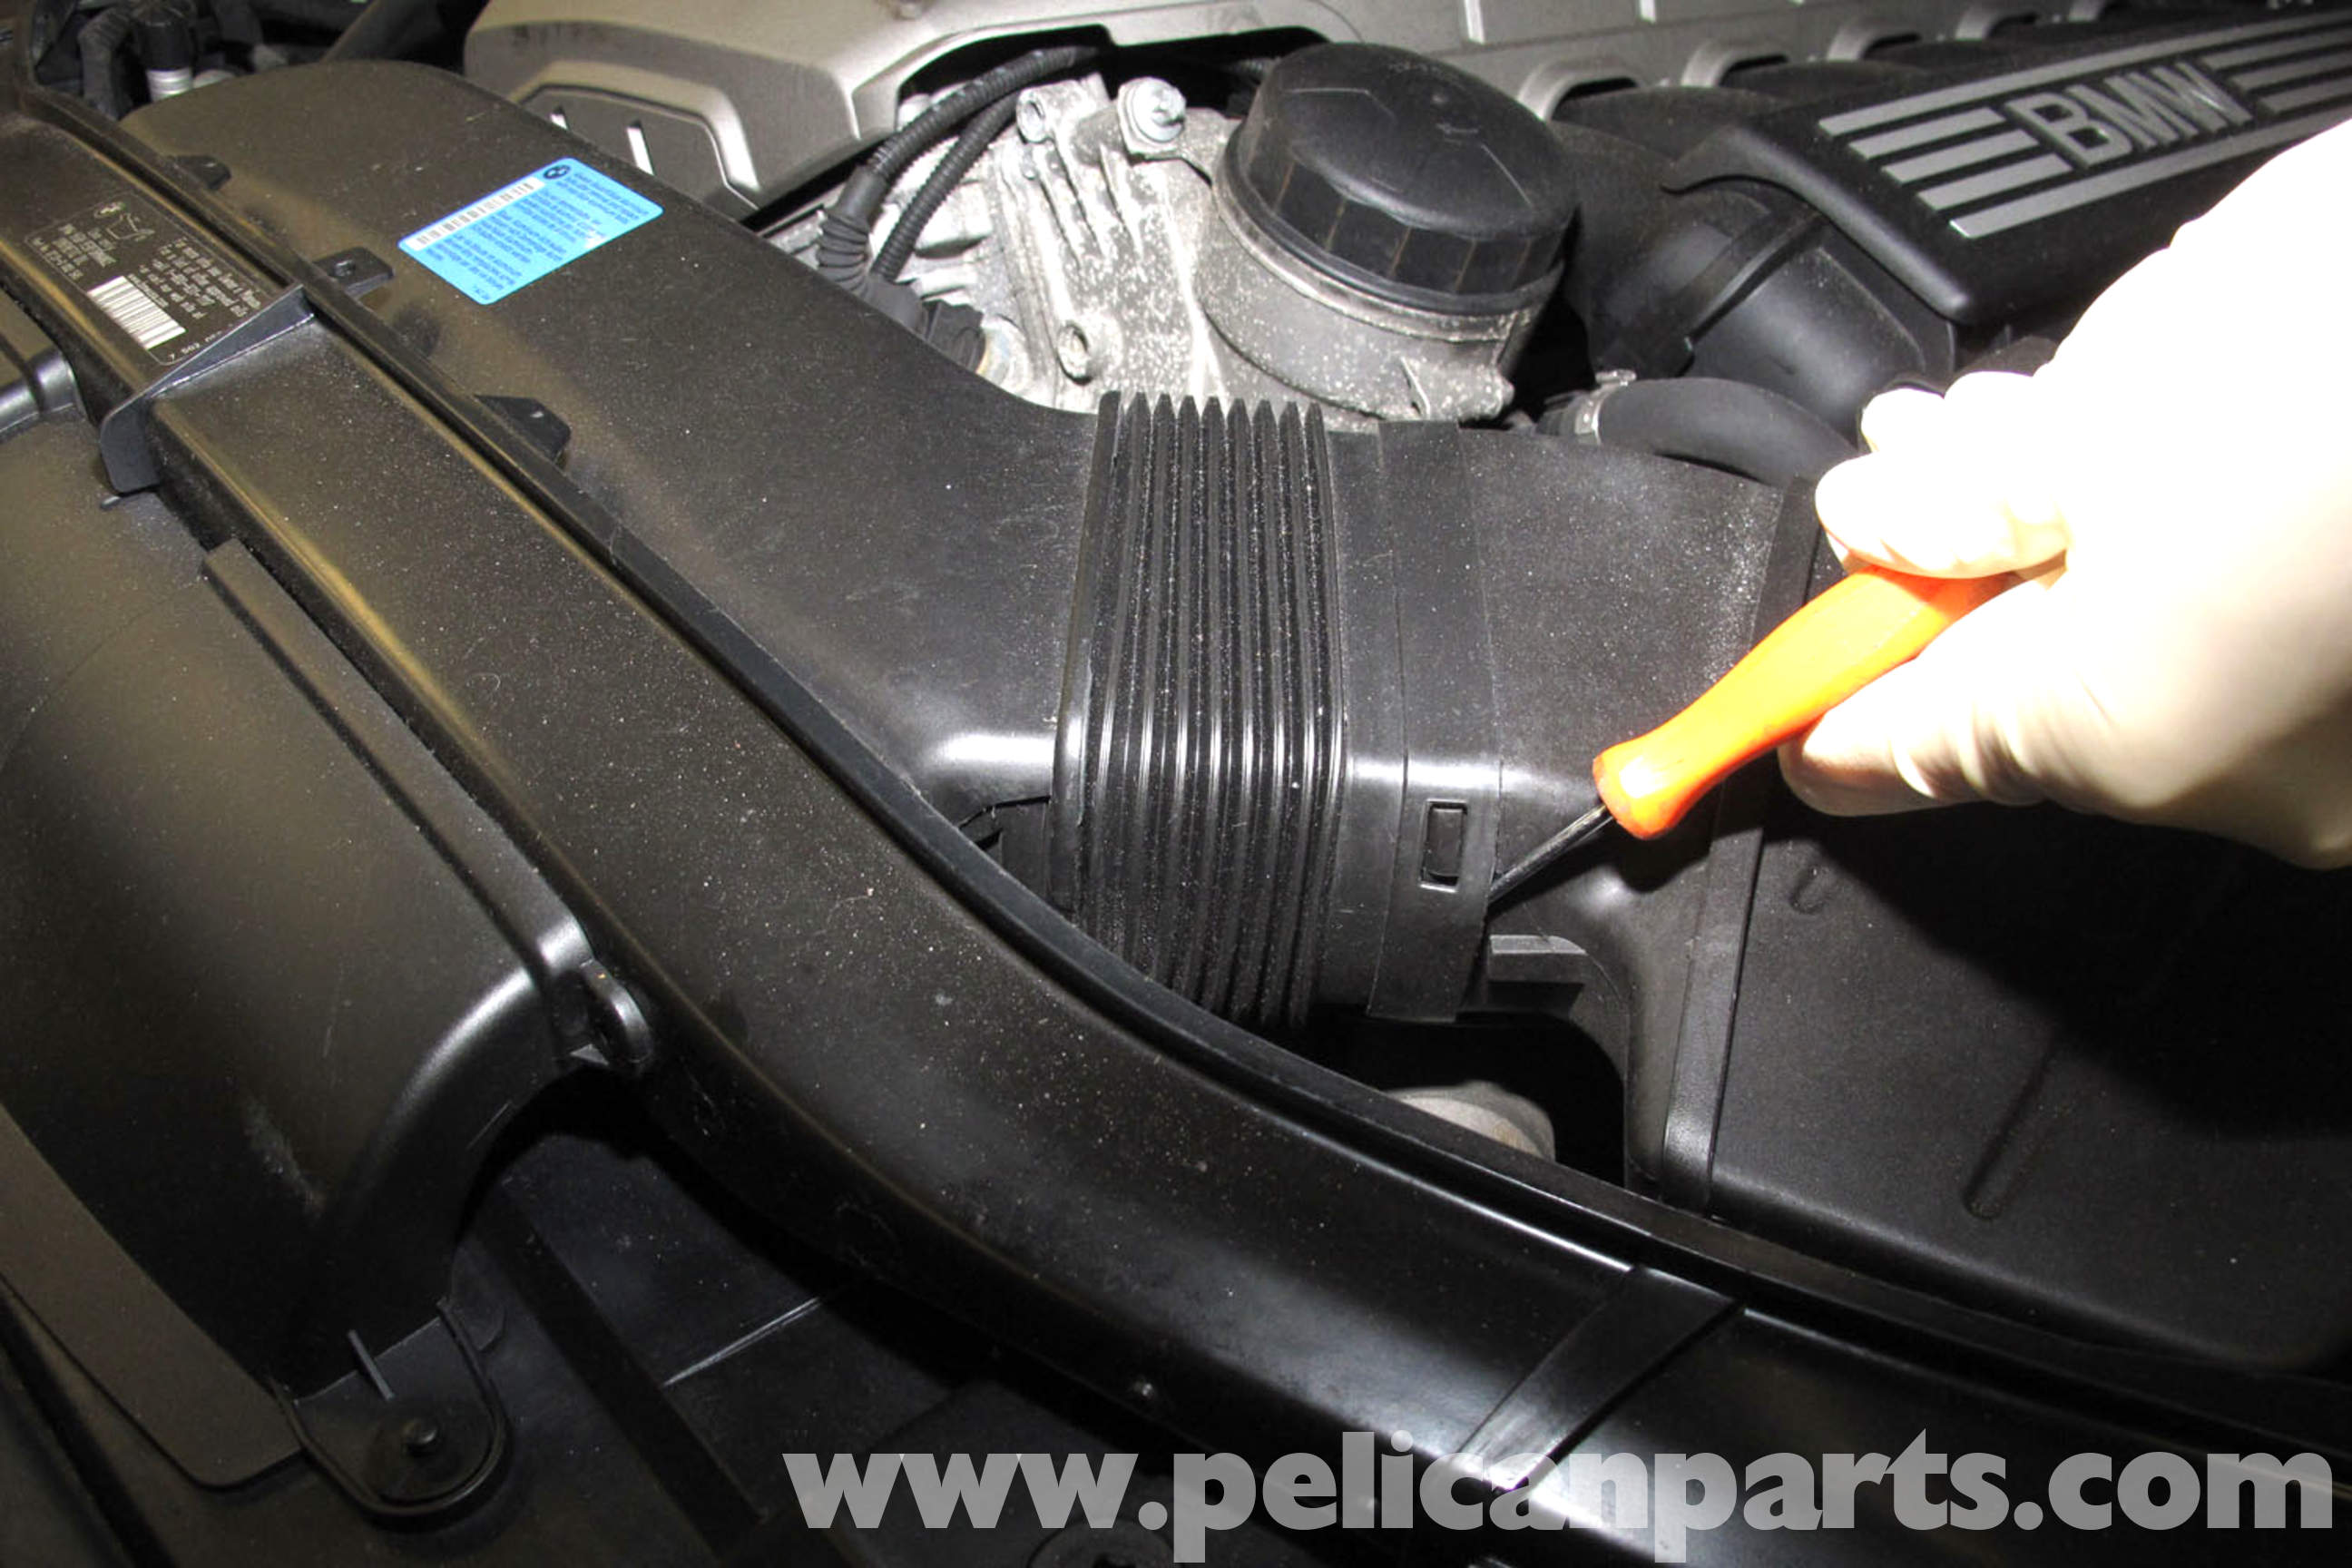 BMW E90 Knock Sensor Replacement | E91, E92, E93 | Pelican Parts DIY ...